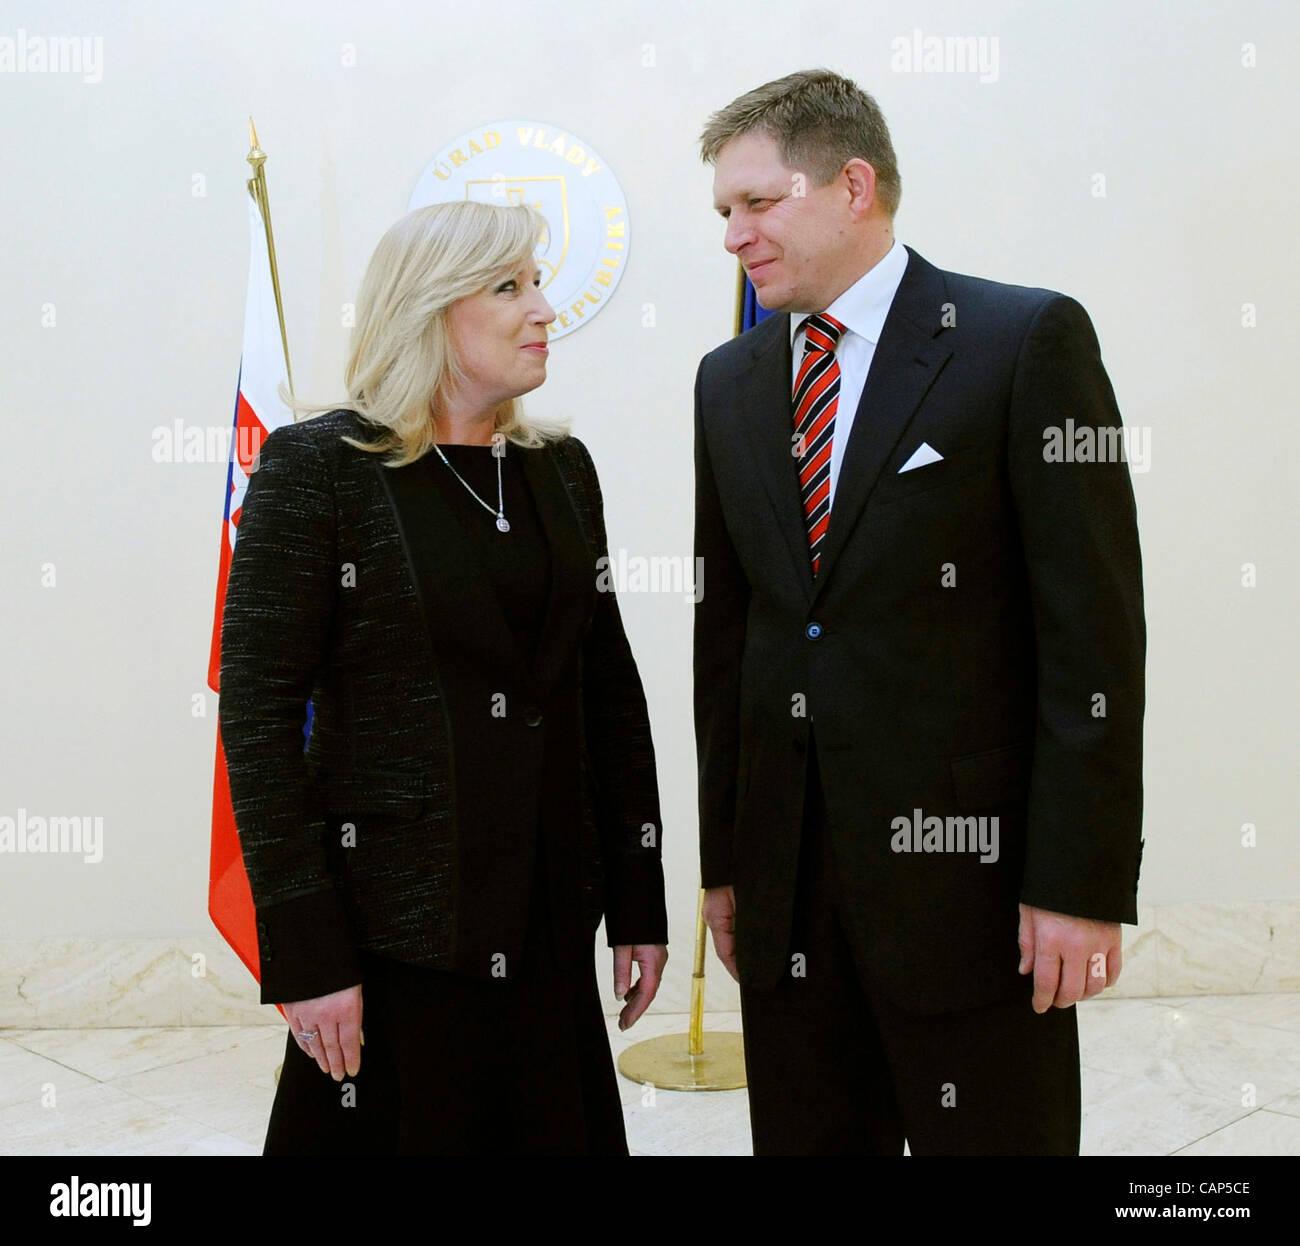 New Slovak Prime Minister Robert Fico, right, and his predecessor Iveta Radicova pose for photographs during a handover - Stock Image